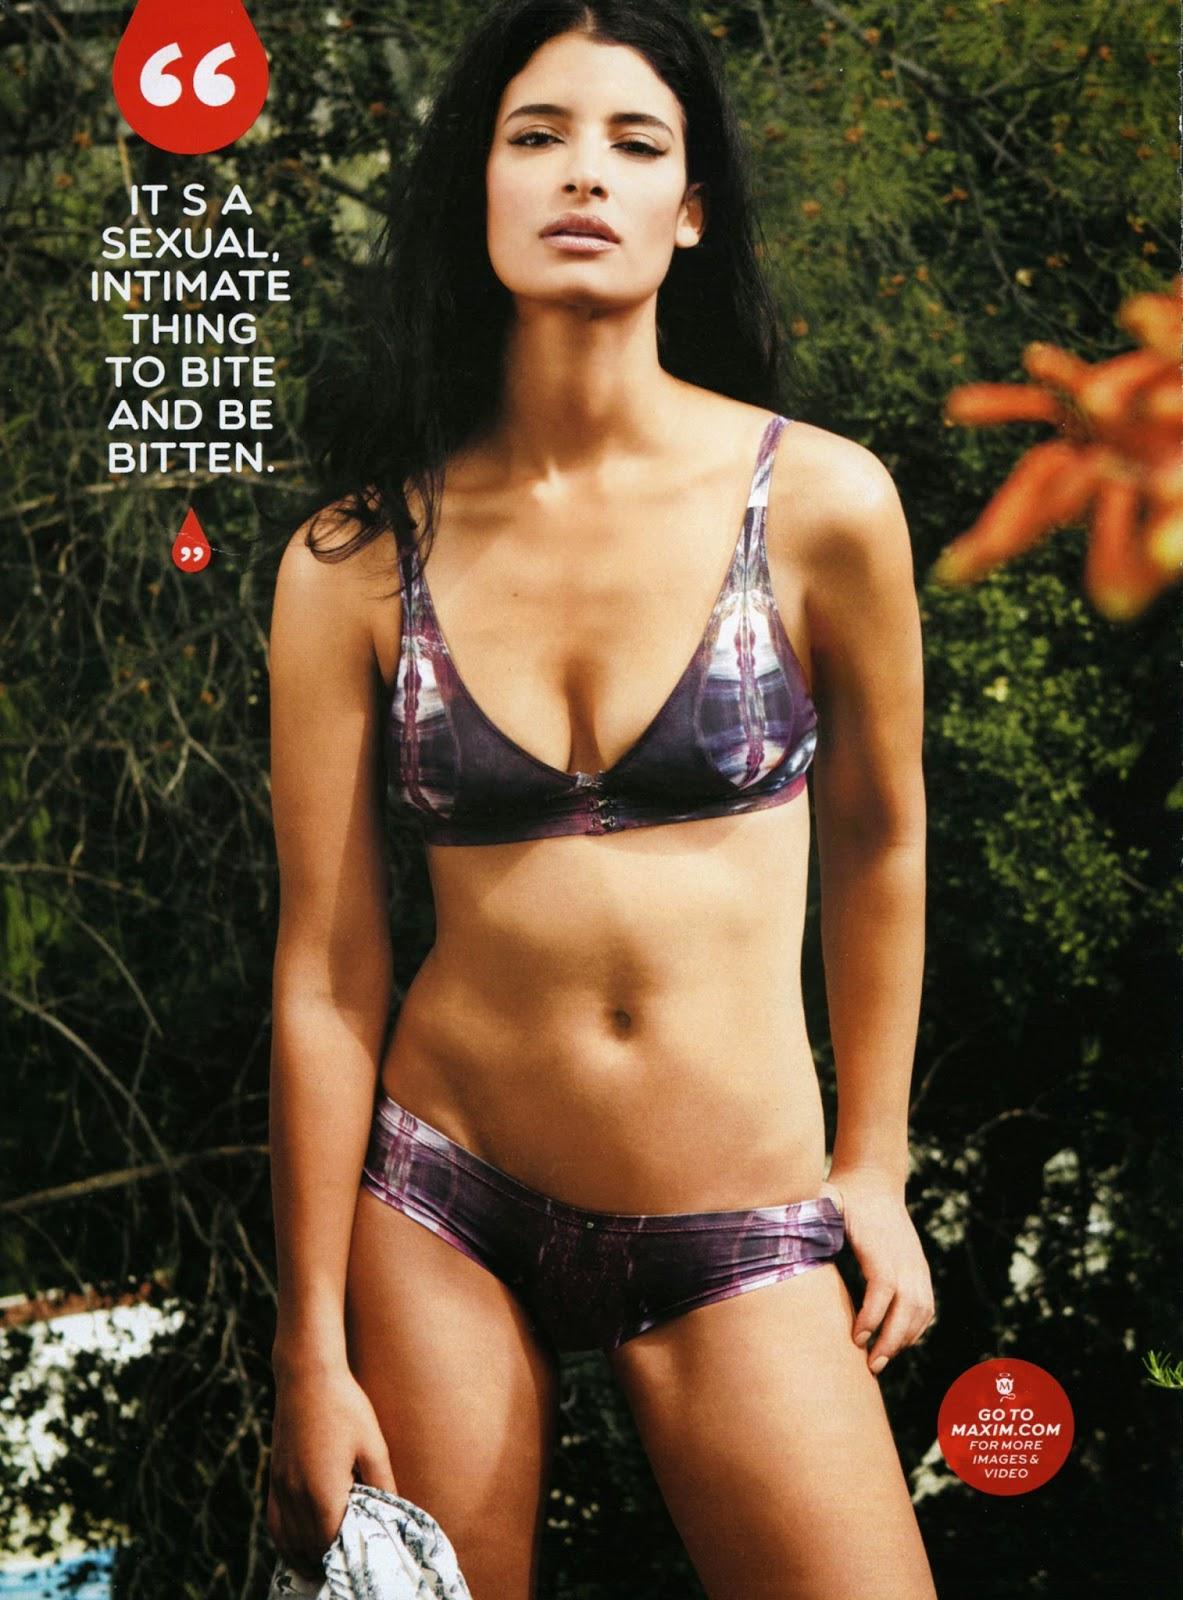 Ashley kranz bikini, pakistani hot sexy girls vagina